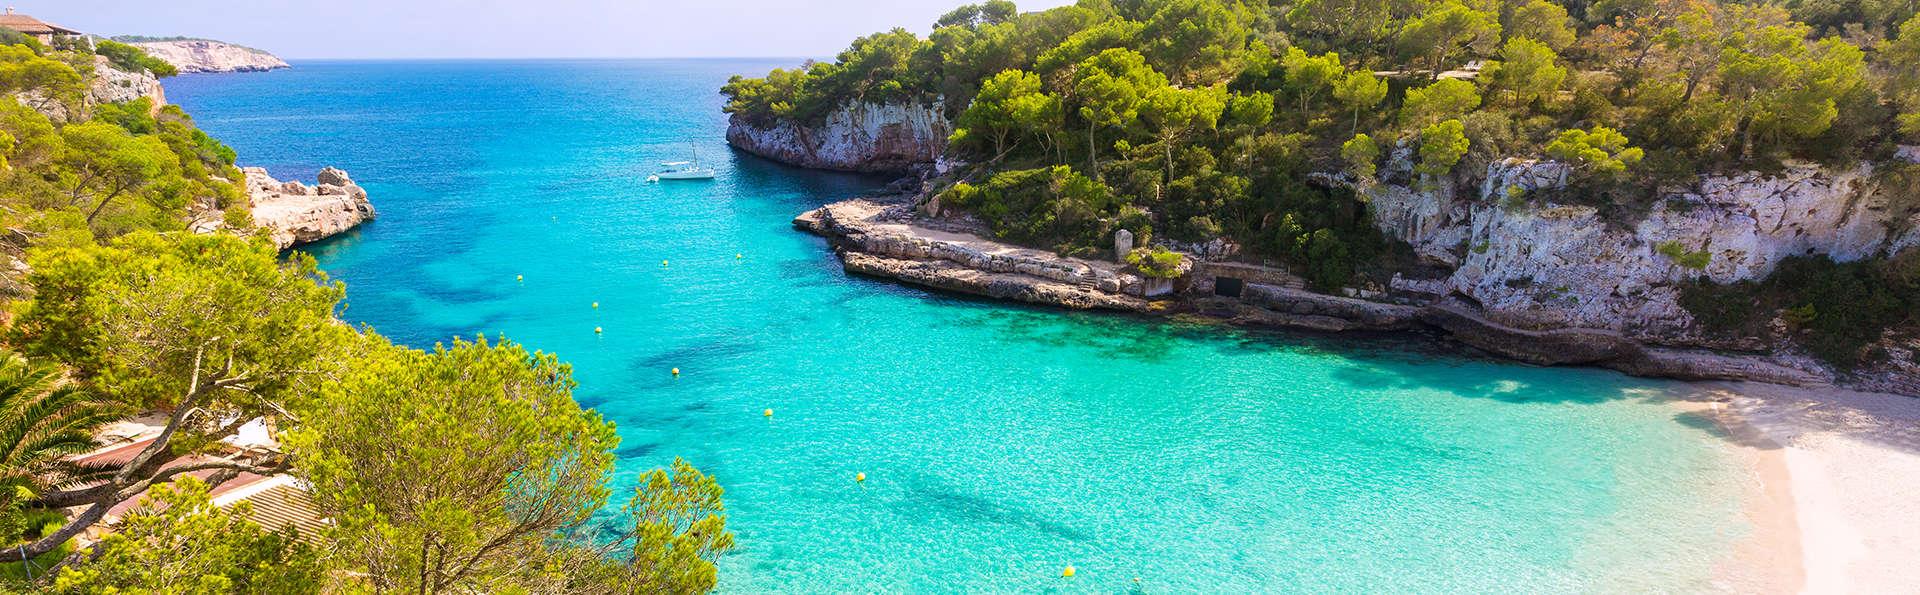 HM Ayron Park - Edit_Mallorca.jpg